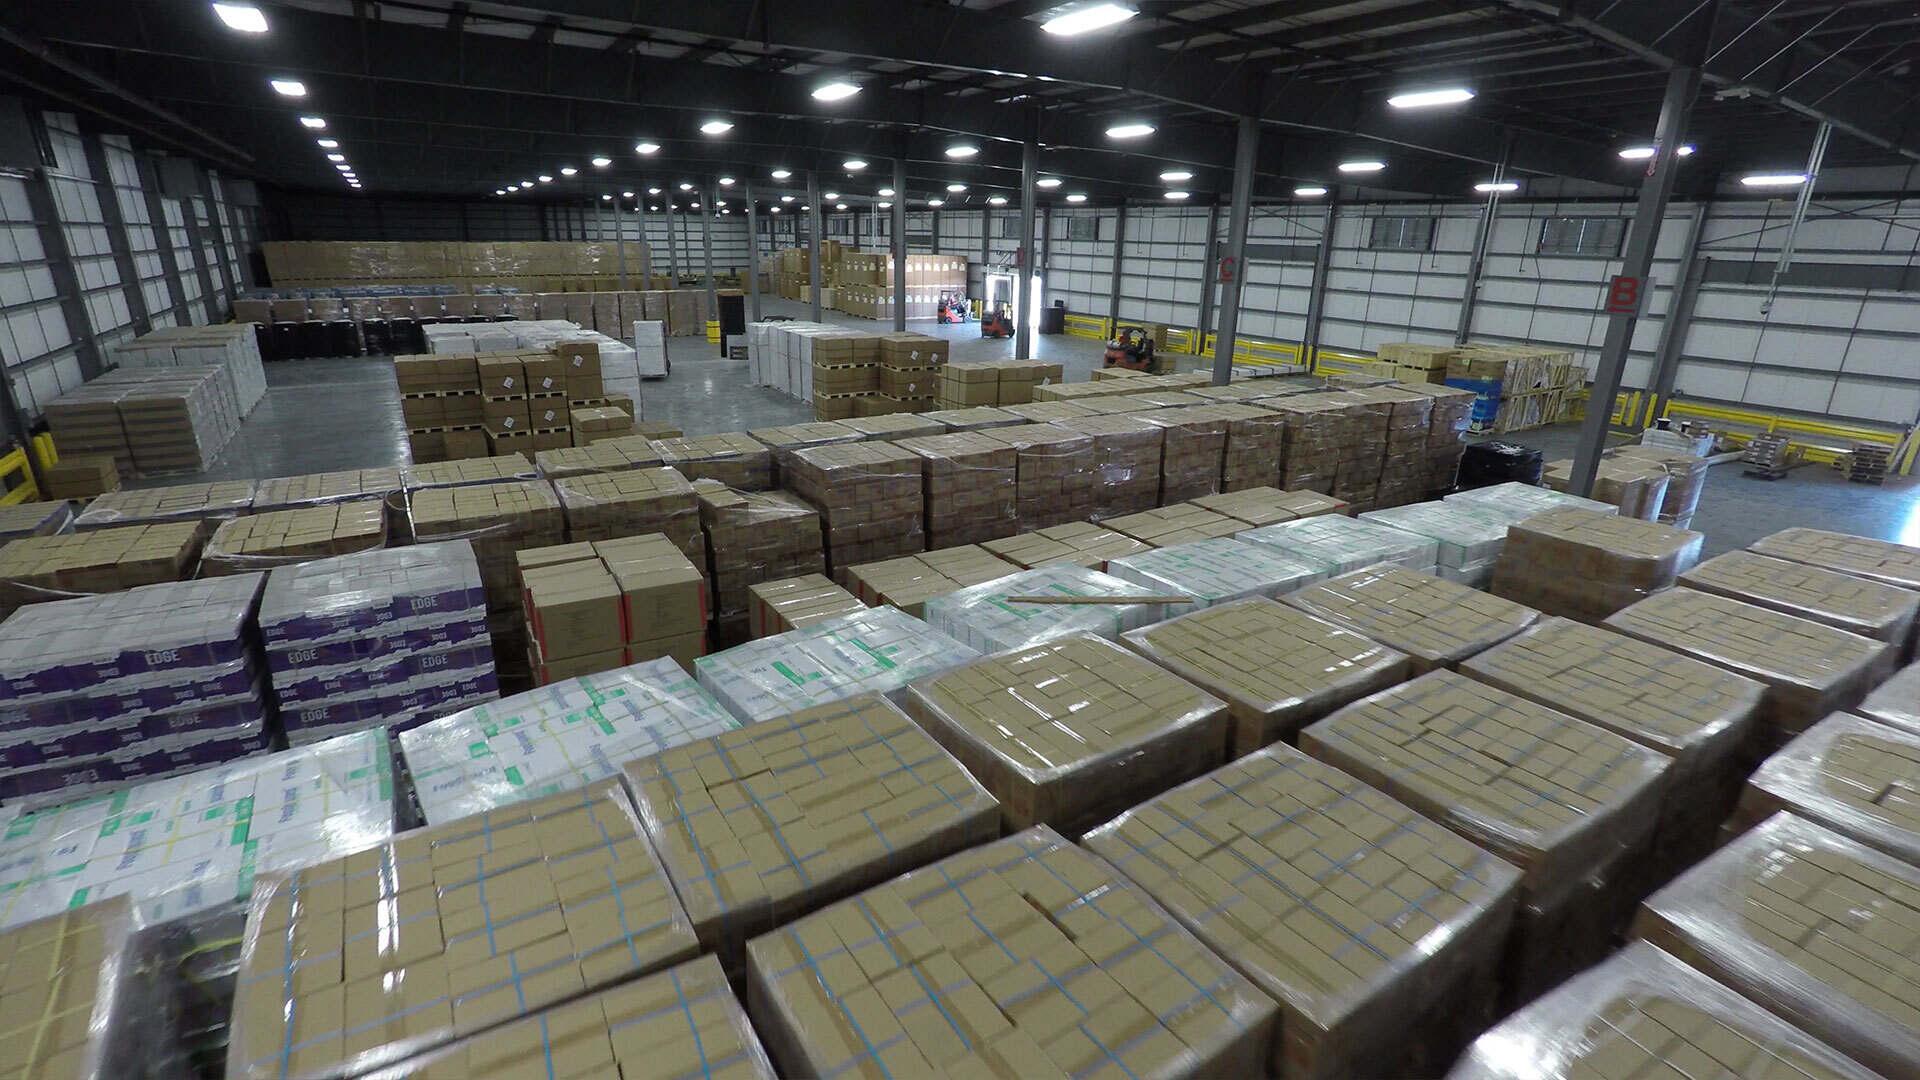 amarillo-texas-distribution-center-news